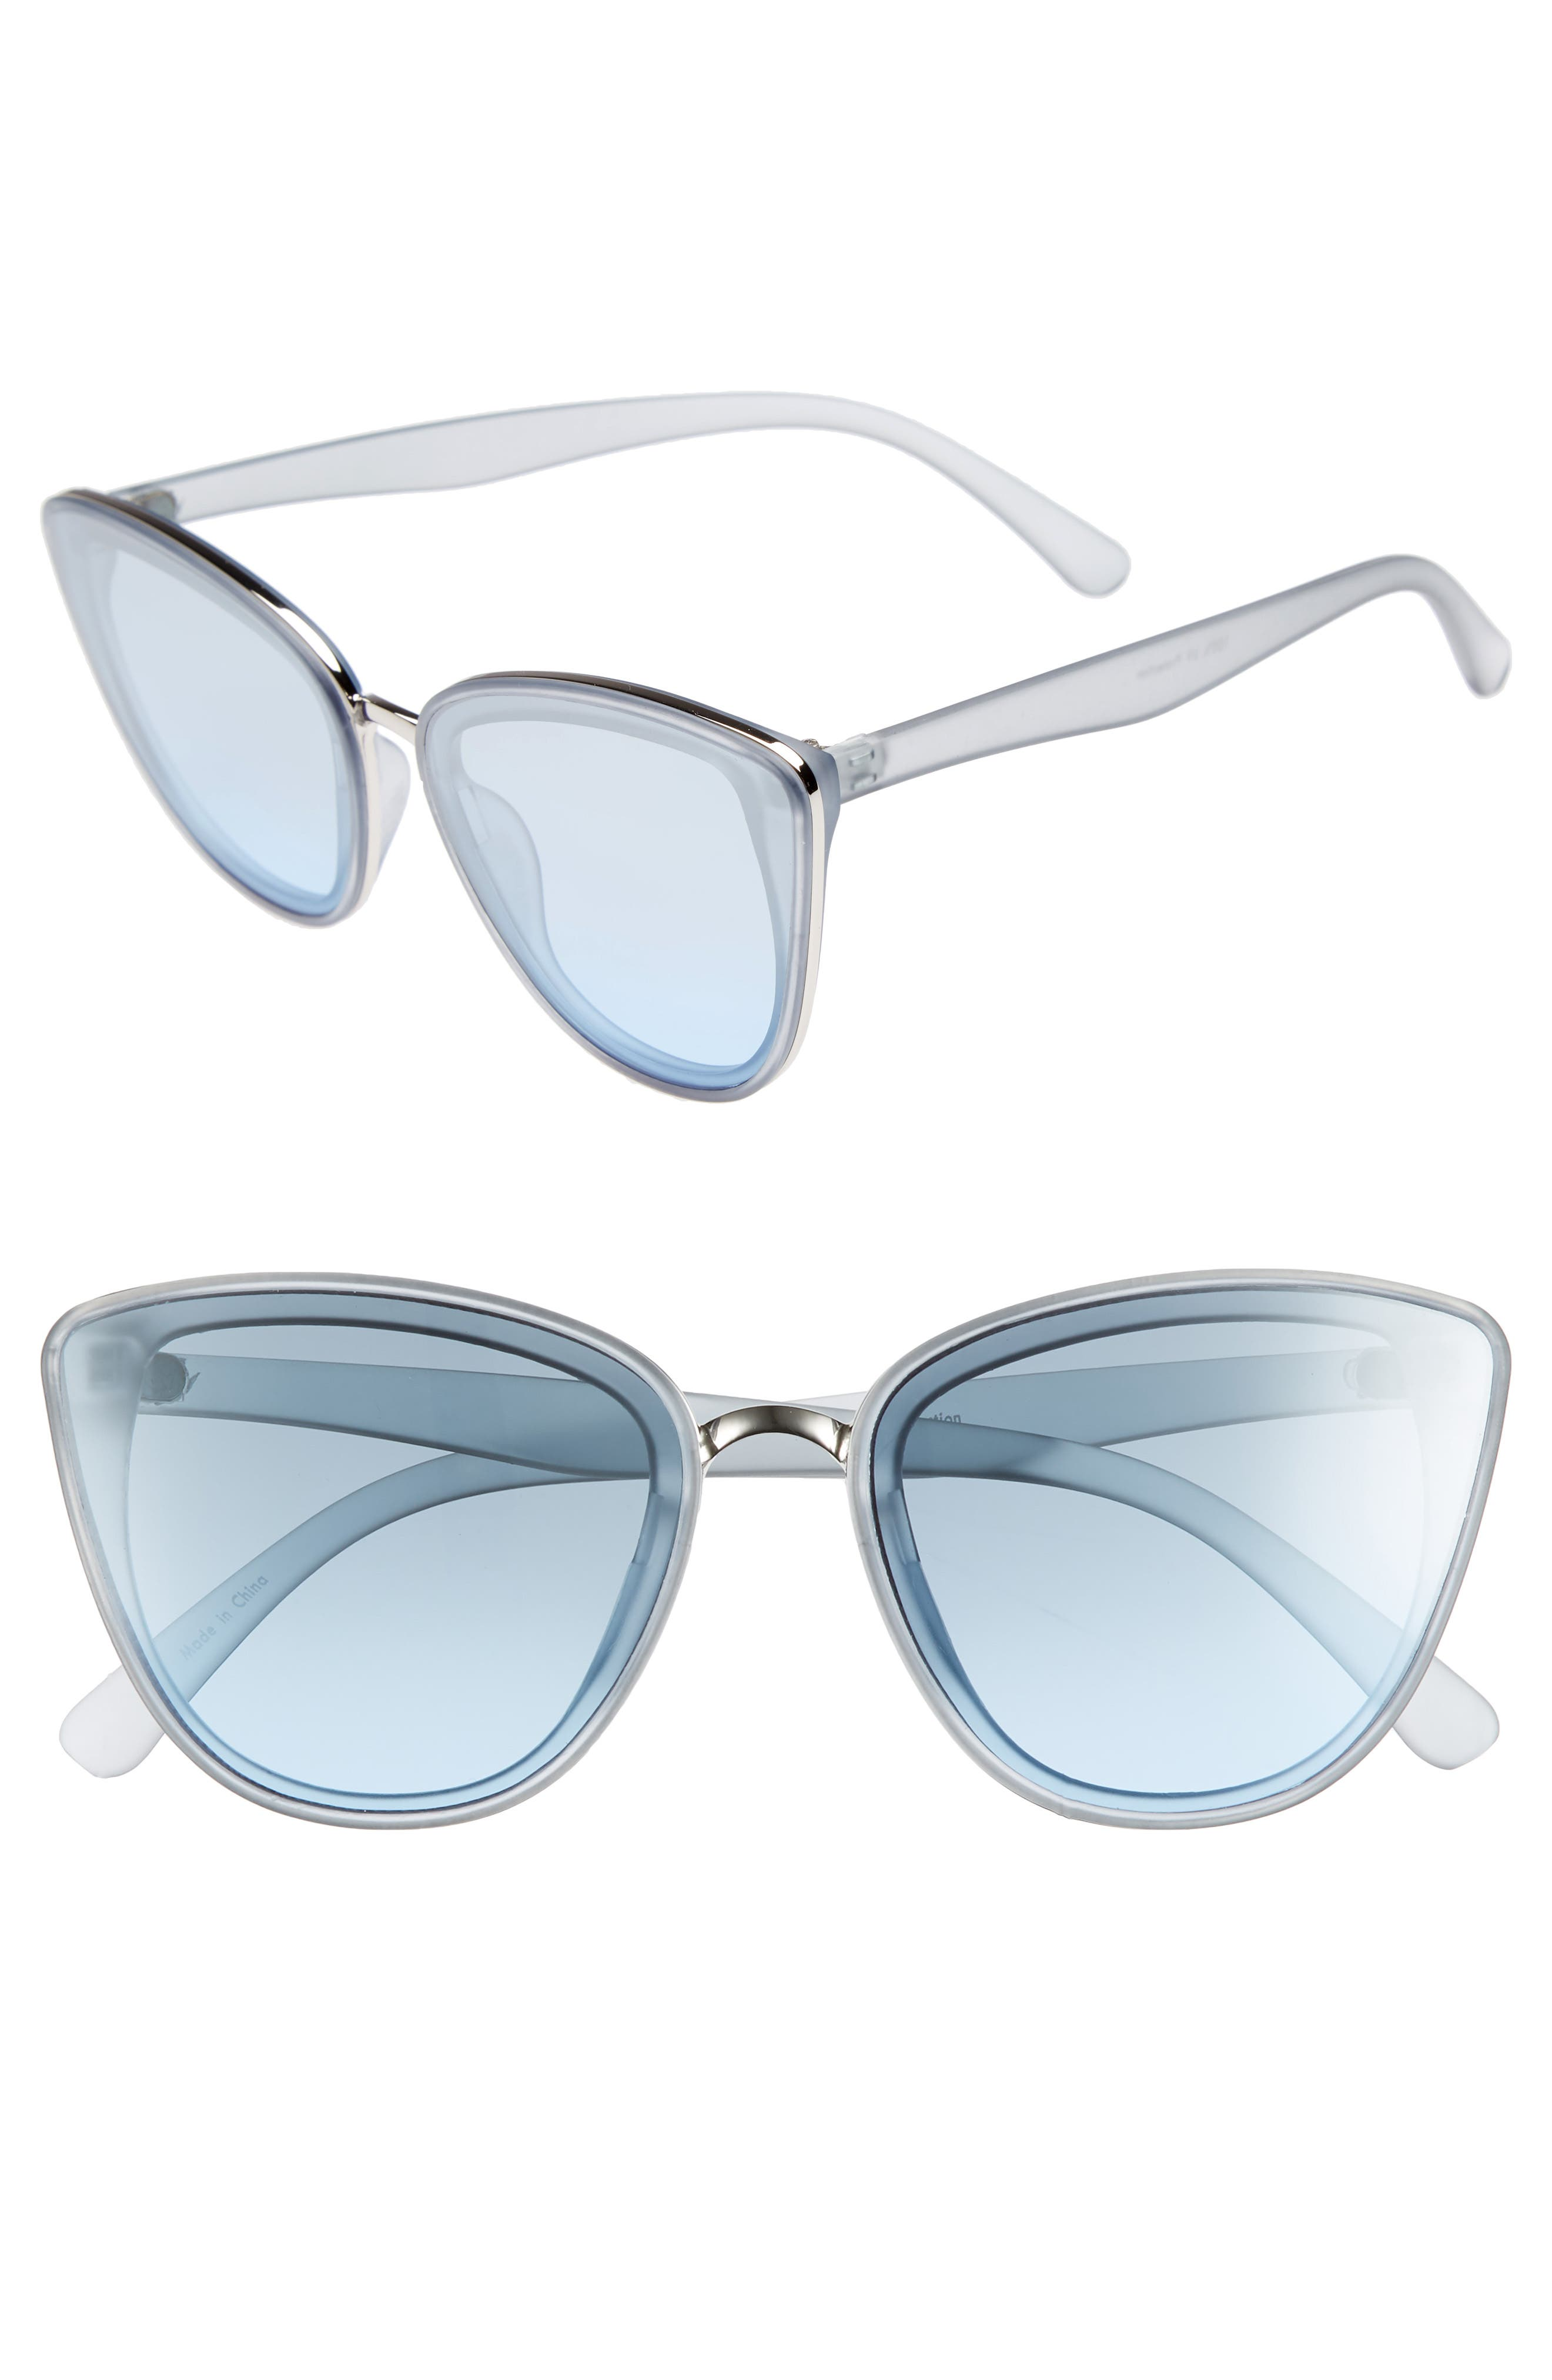 59mm Perfect Cat Eye Sunglasses,                         Main,                         color, Blue/ Blue